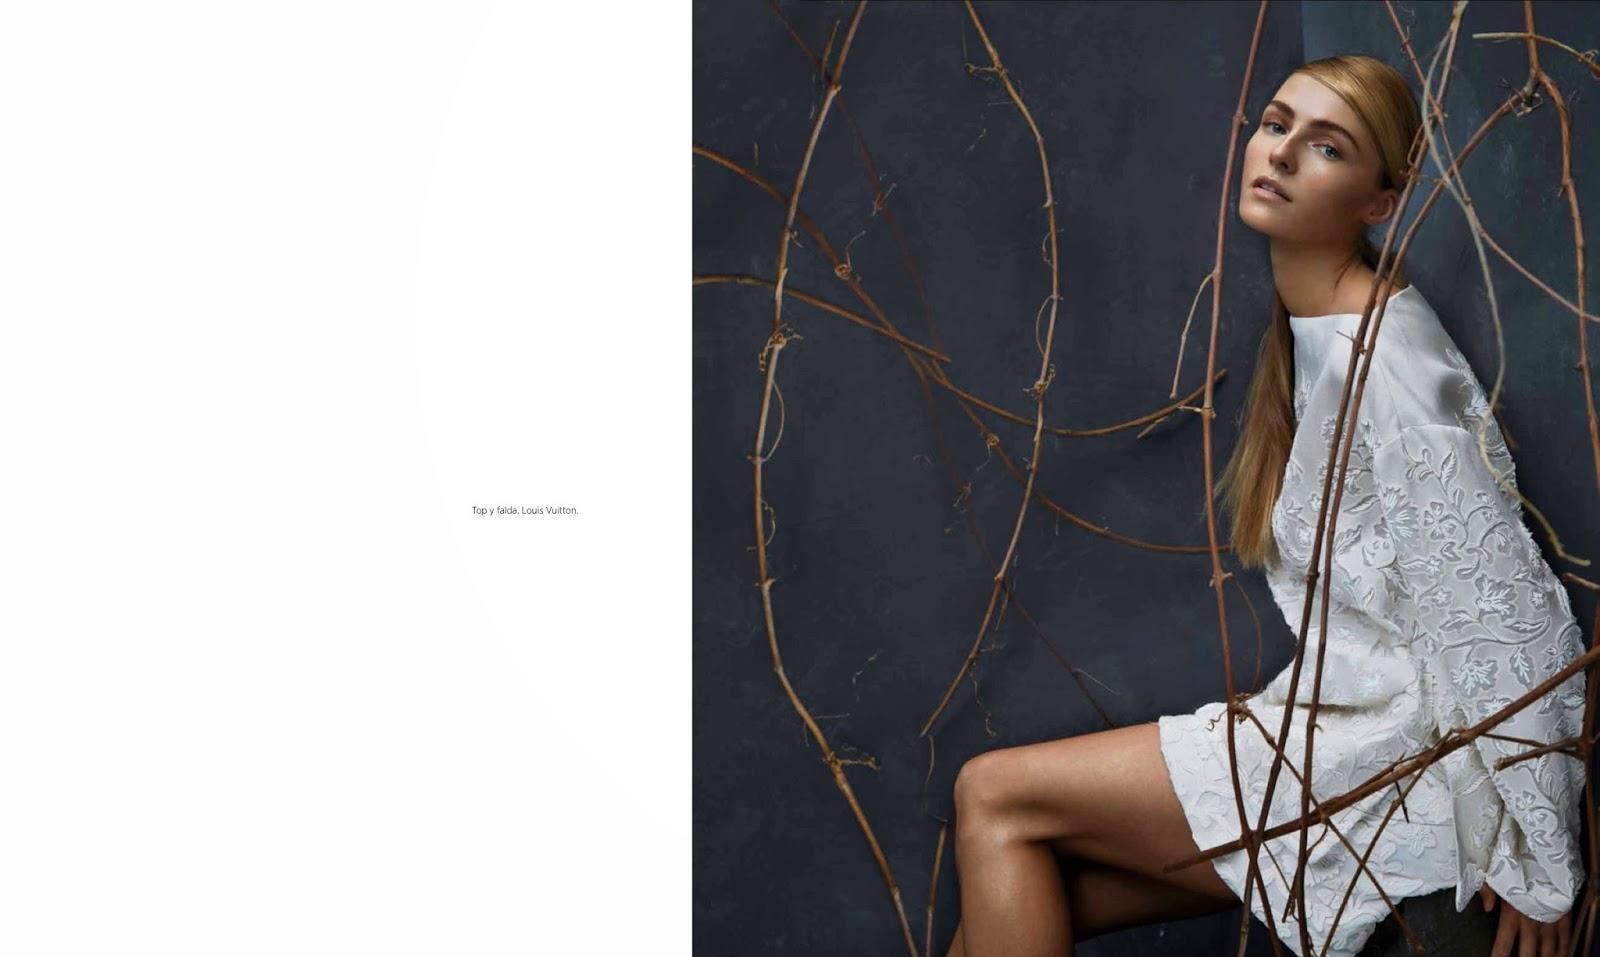 fashion_scans_remastered-valentina_zelyaeva-harpers_bazaar_en_espanol-january_2014-scanned_by_vampirehorde-hq-6.jpg